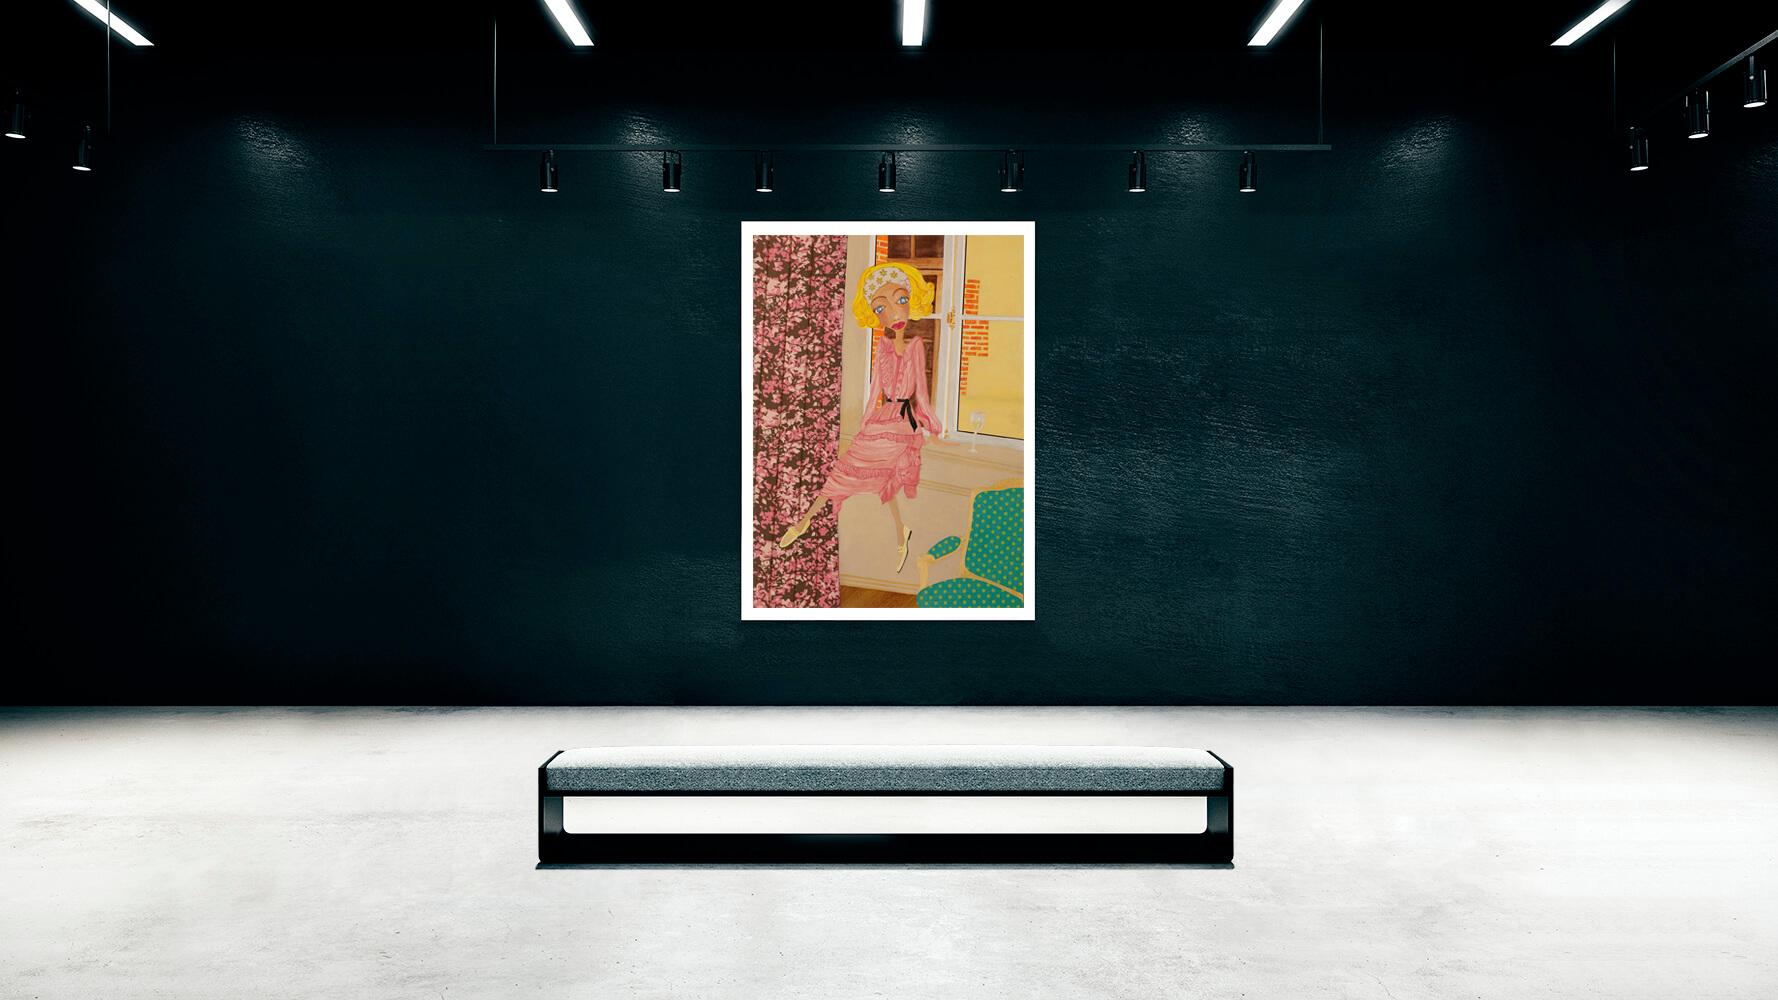 e-peccatis-et-morte-exposicion-colectiva-Horno-Art-Virtual-Galleryl-galeria-arte-fotografia-artistica-decorativa-decoracion-sandra-trujillo